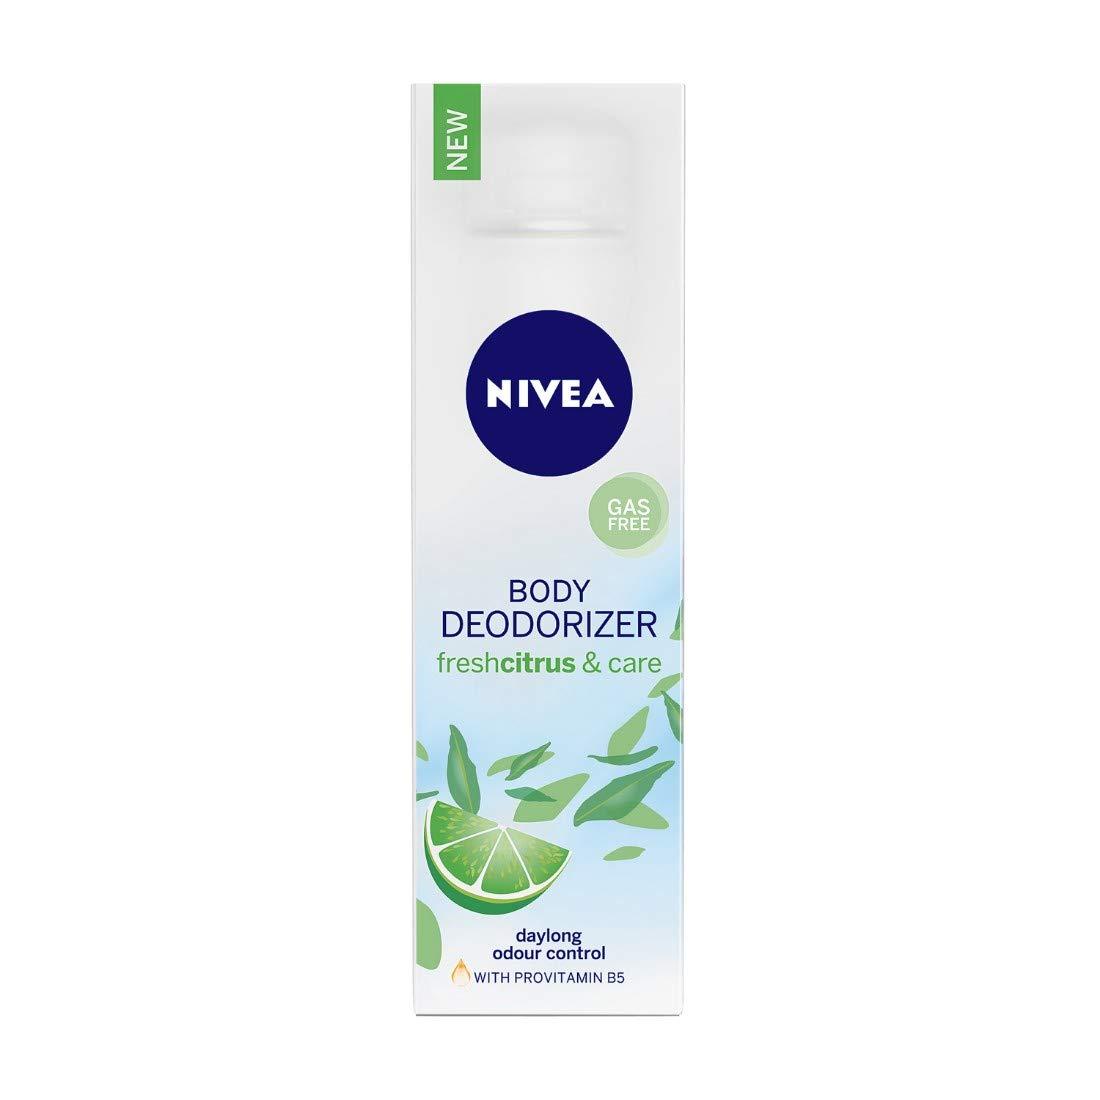 NIVEA Deodorizer, Fresh Citrus & Care Deodorant, Gas Free, Women